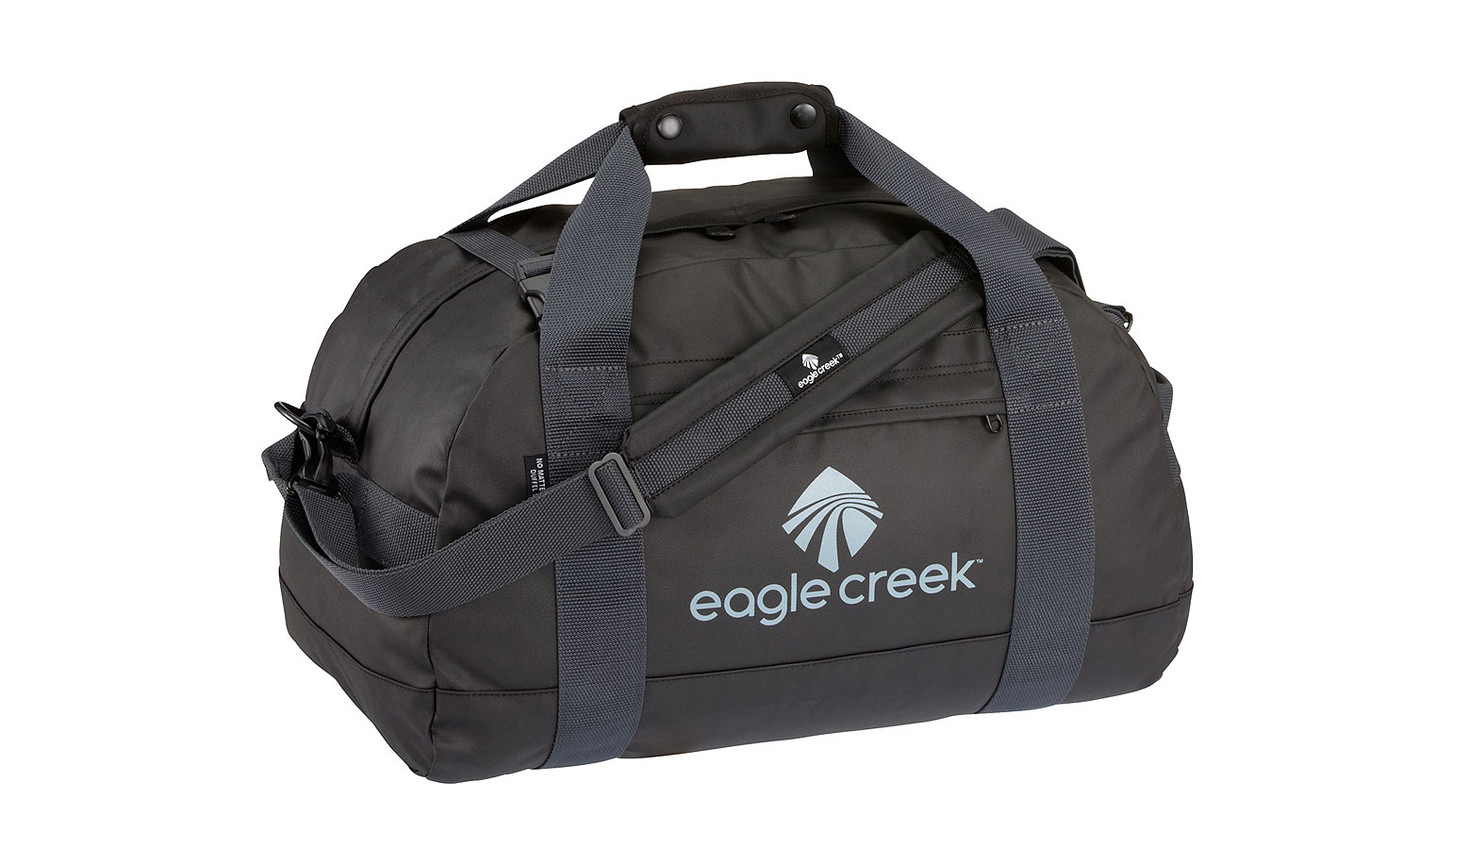 EAGLE CREEK - กระเป๋า Duffel รุ่น No Matter What ไซส์ M สีดำ ความจุ 59 ลิตร